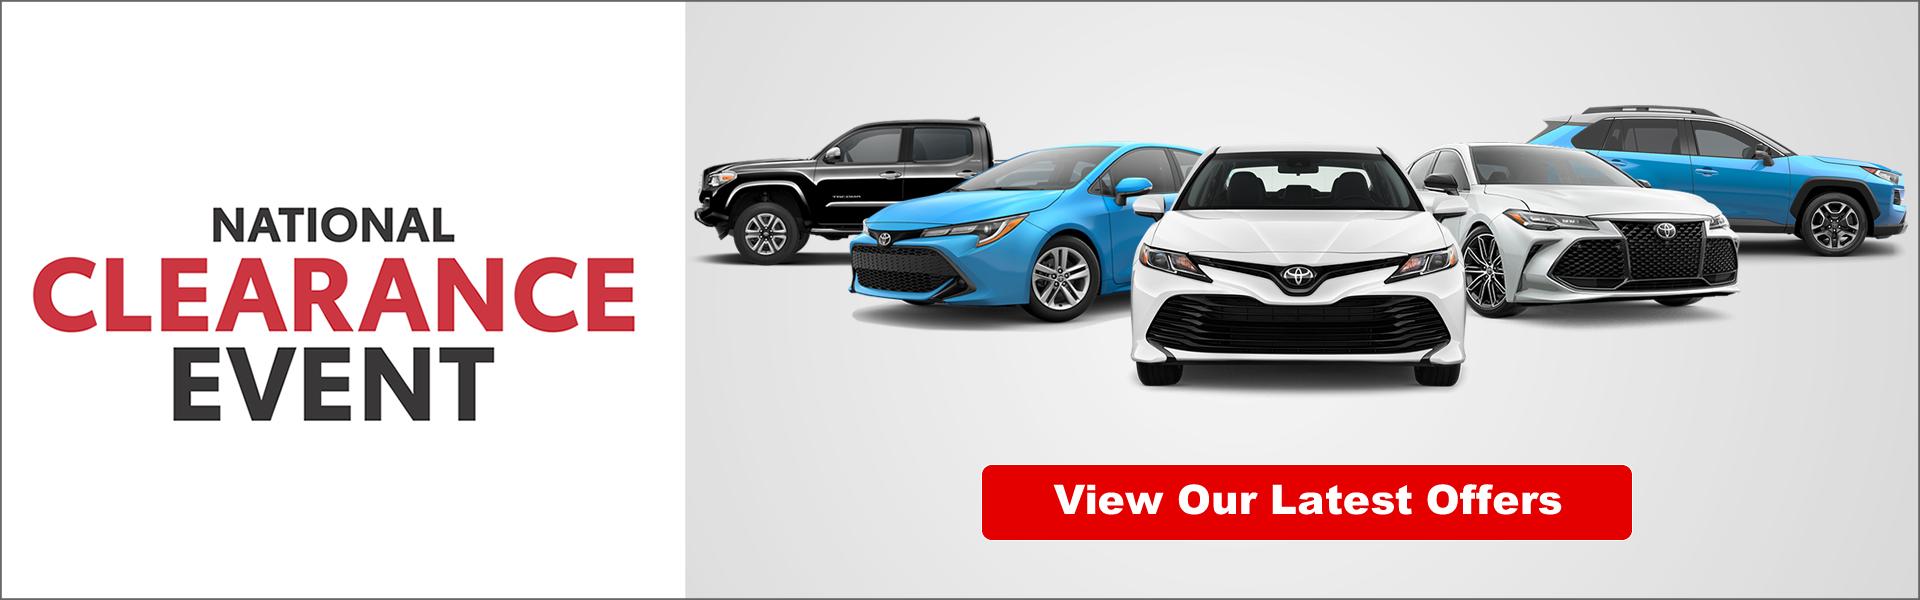 Boston Toyota Dealer | Expressway Toyota Serving Braintree & Quincy MA